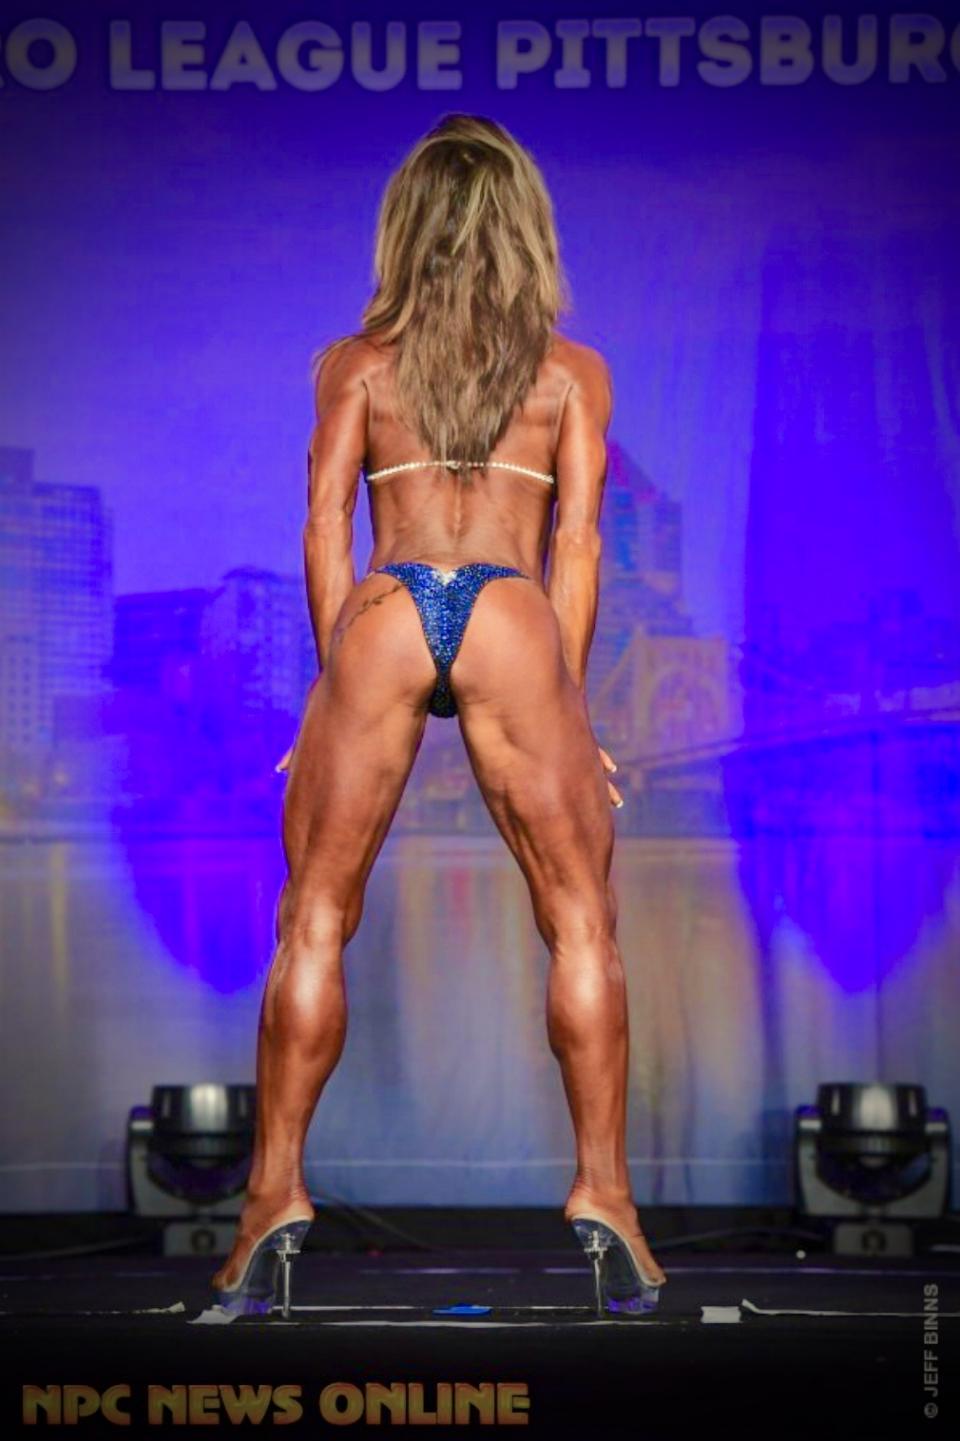 Shelly Paton in a Merry Christine Bodywear competition bikini